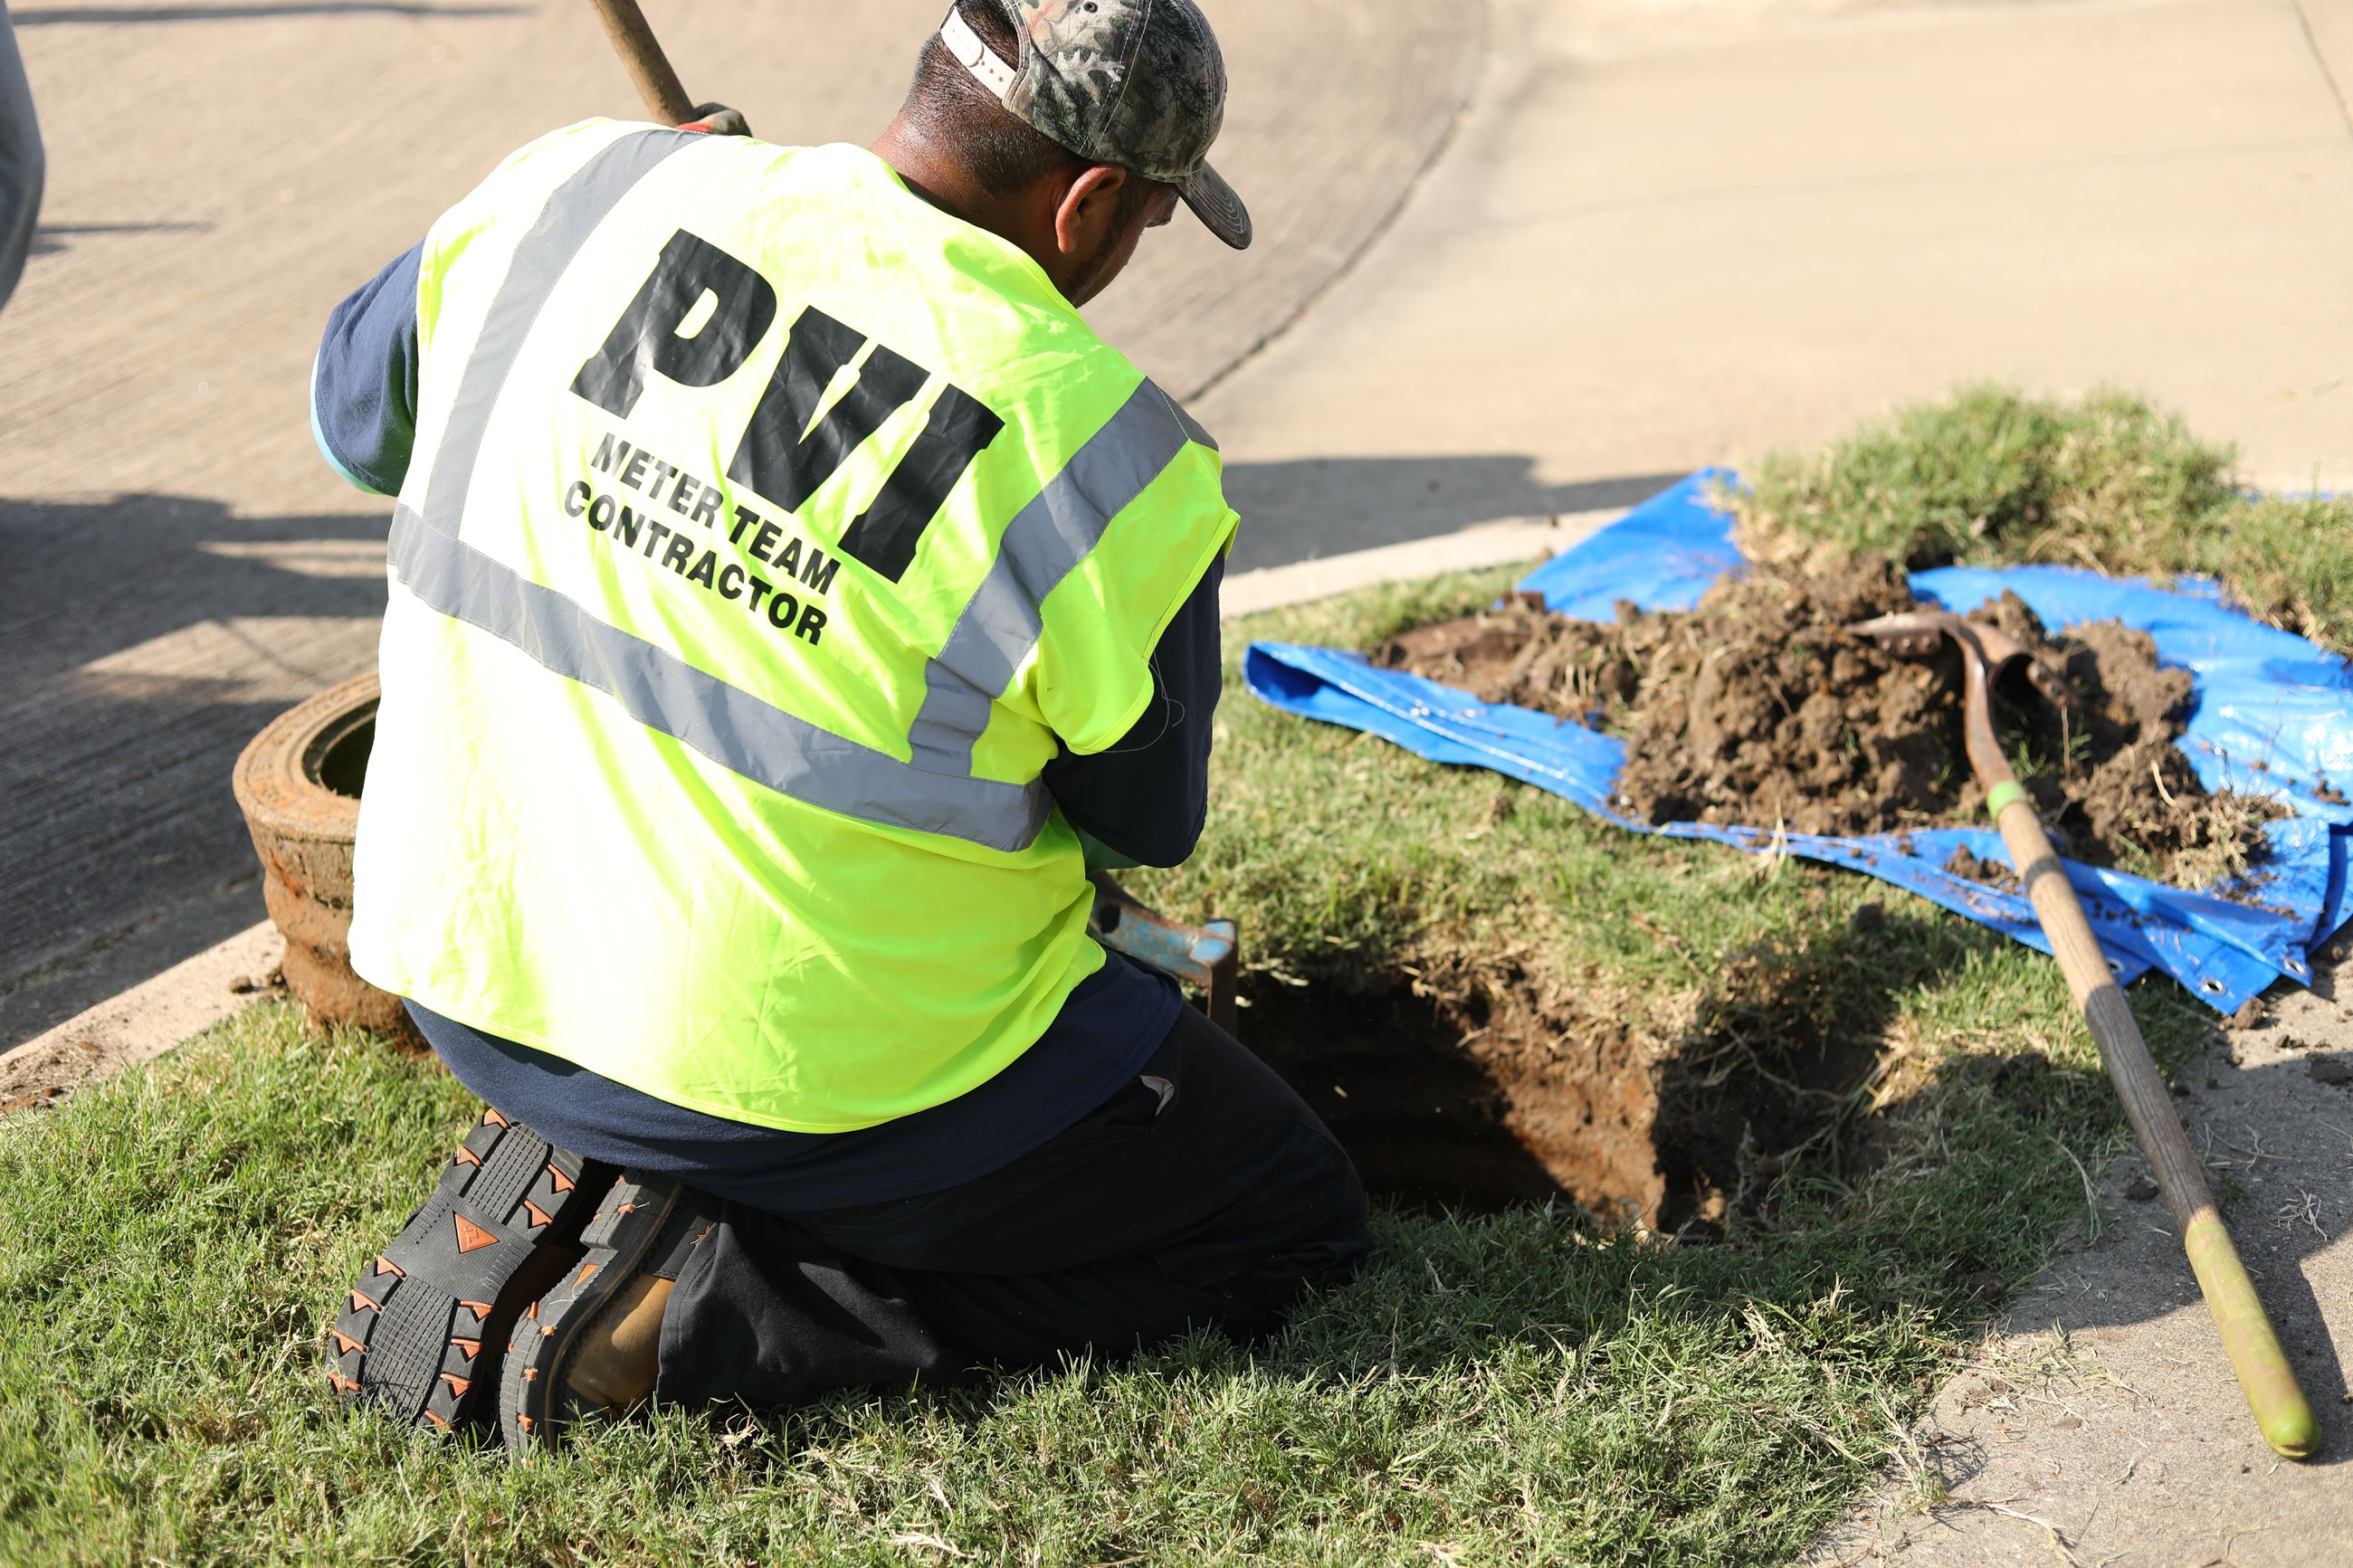 PVI worker installs meter